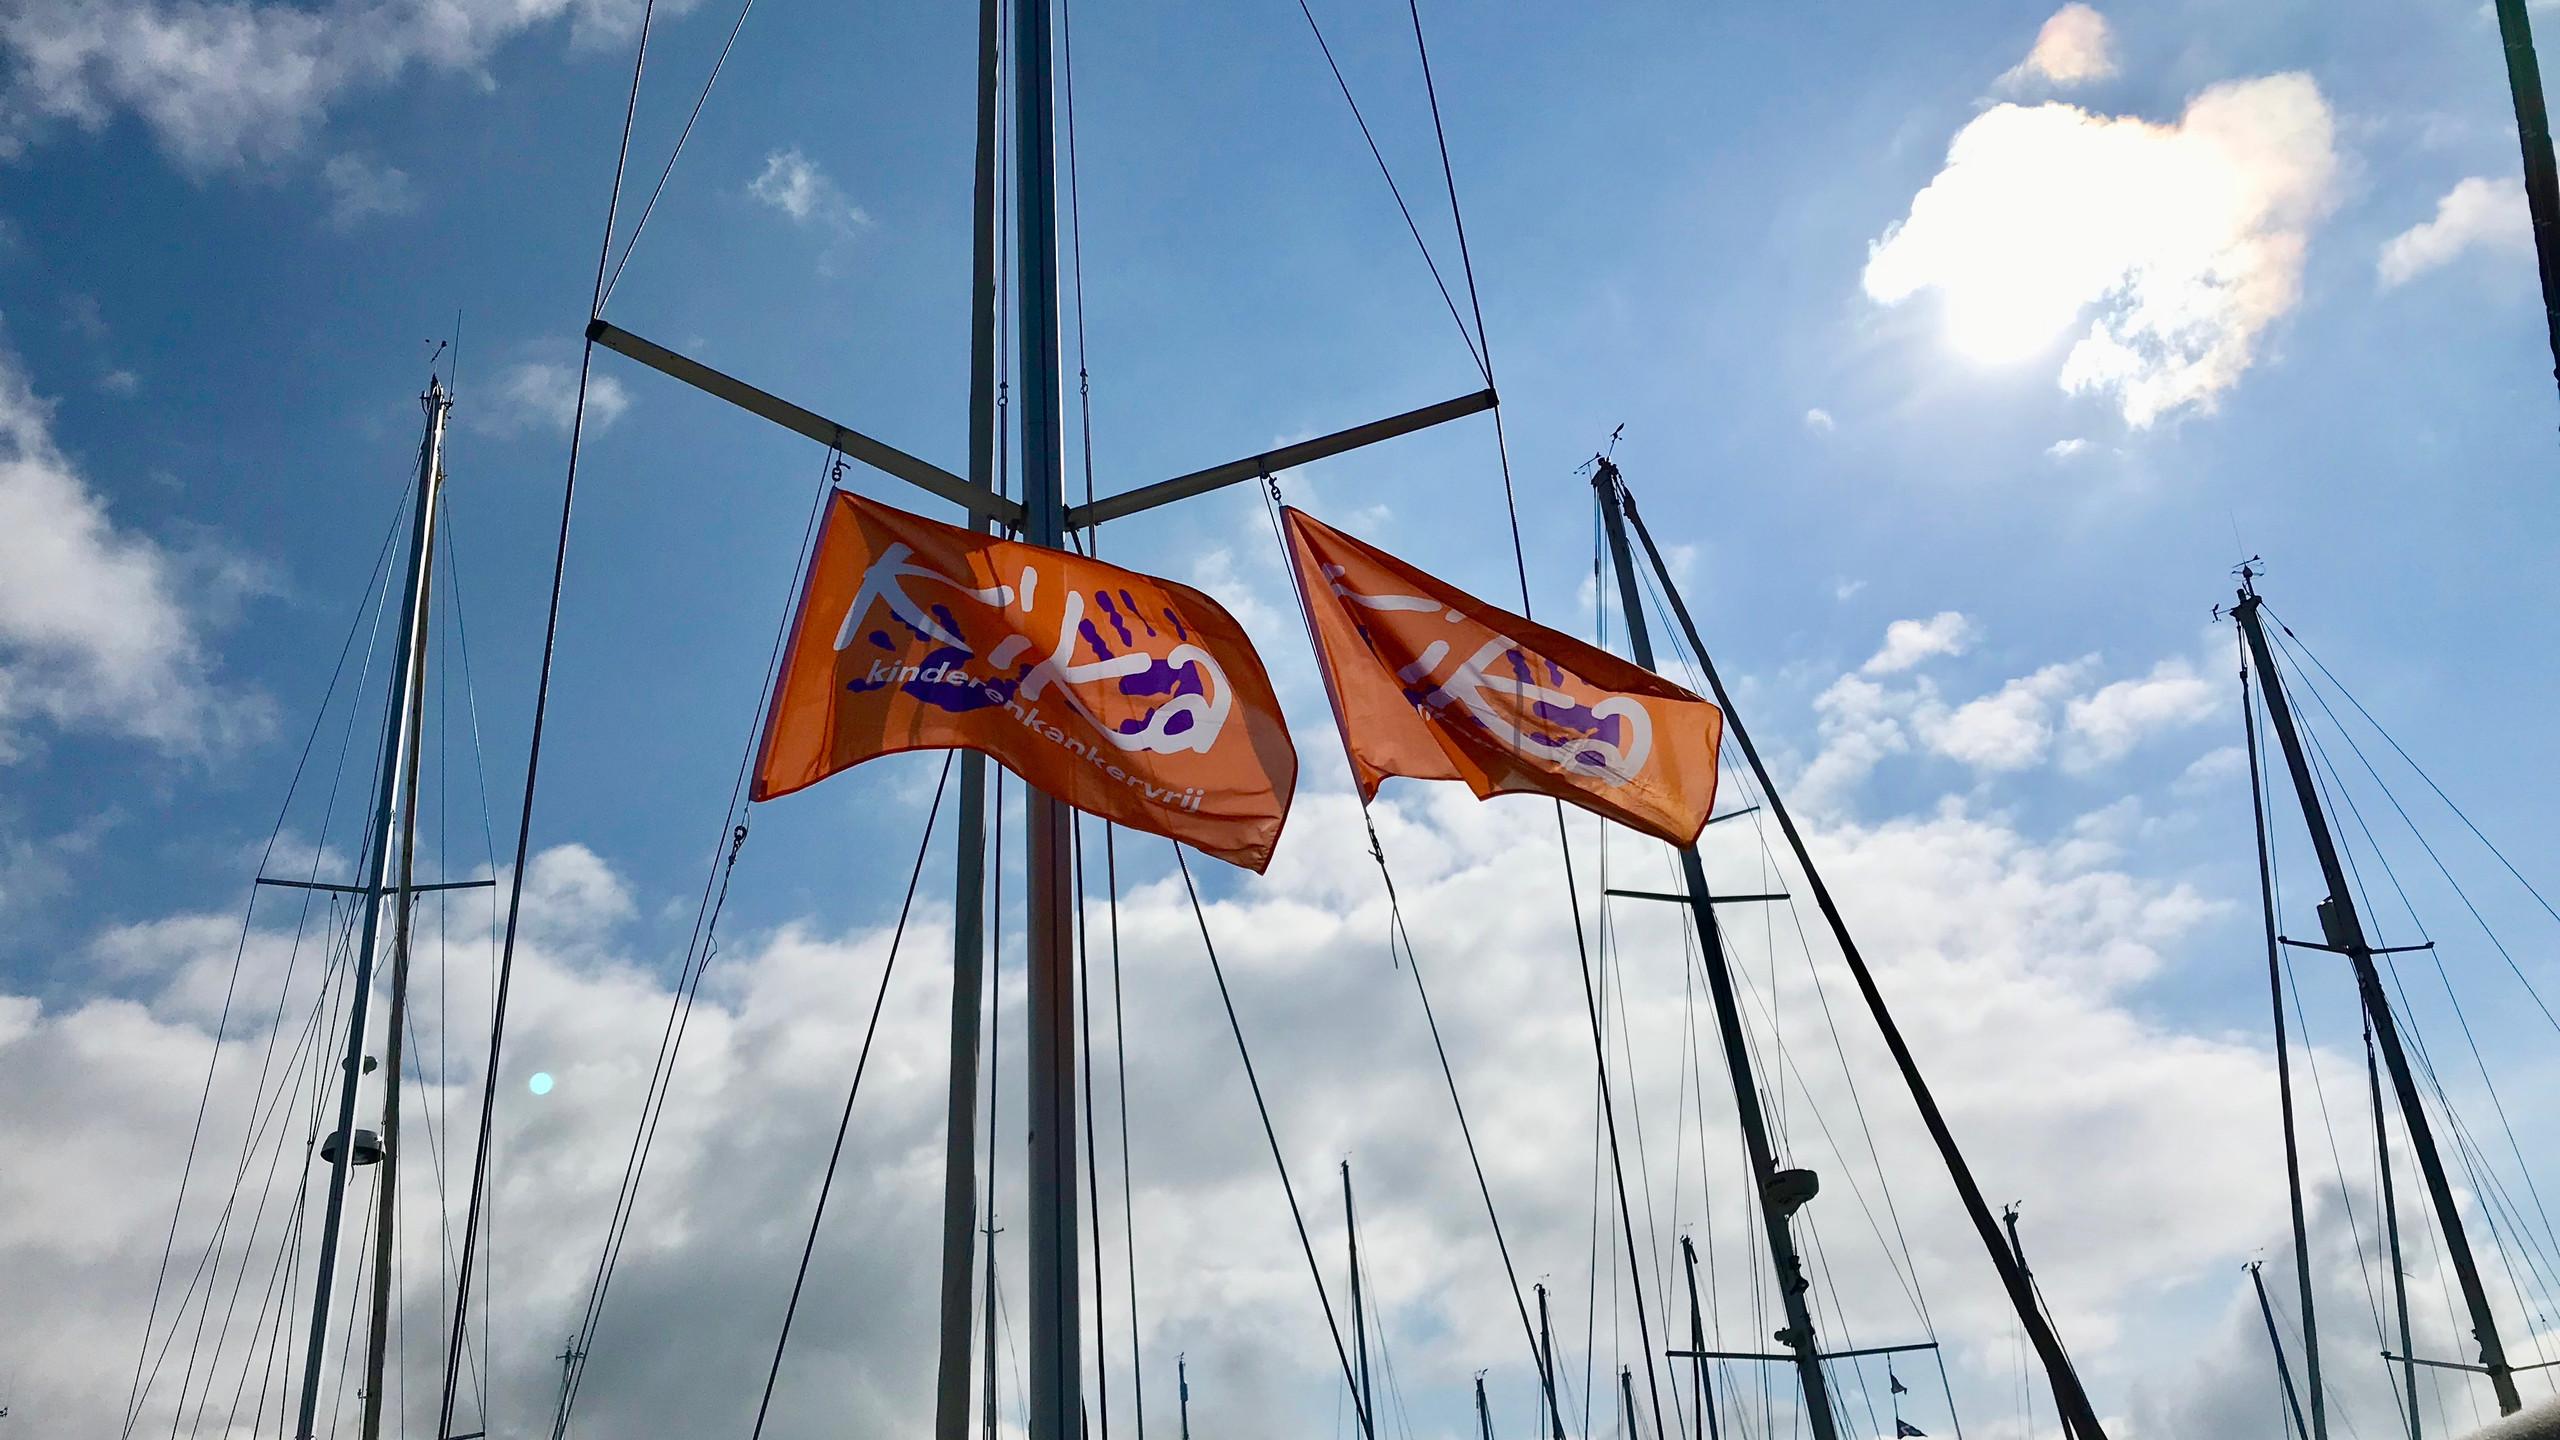 KiKa flags reinstated for the 2019 season